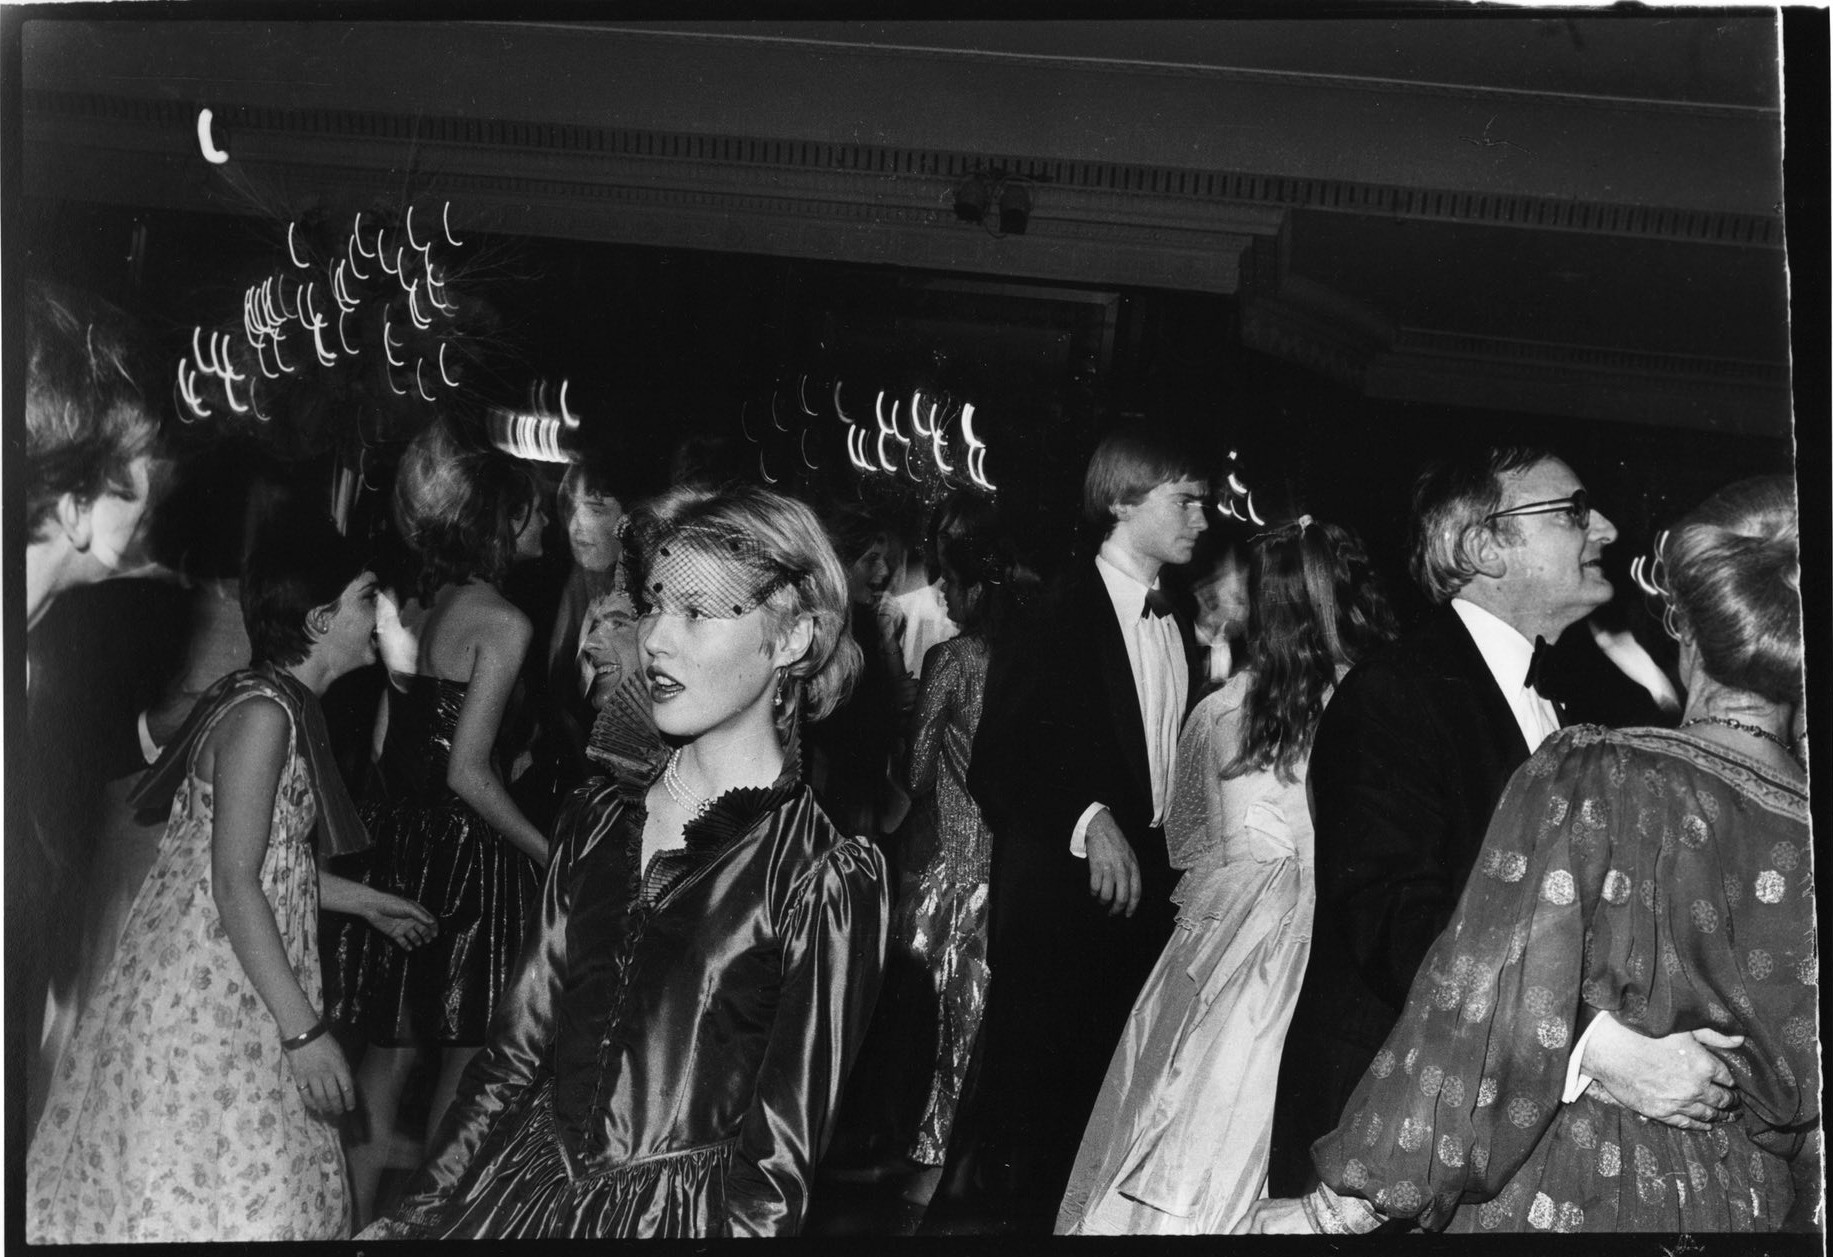 Леди Хенриетта Батхерст на Балу Золушки. Отель «Дорчестер», декабрь 1980 года. Бал Золушки — благотв